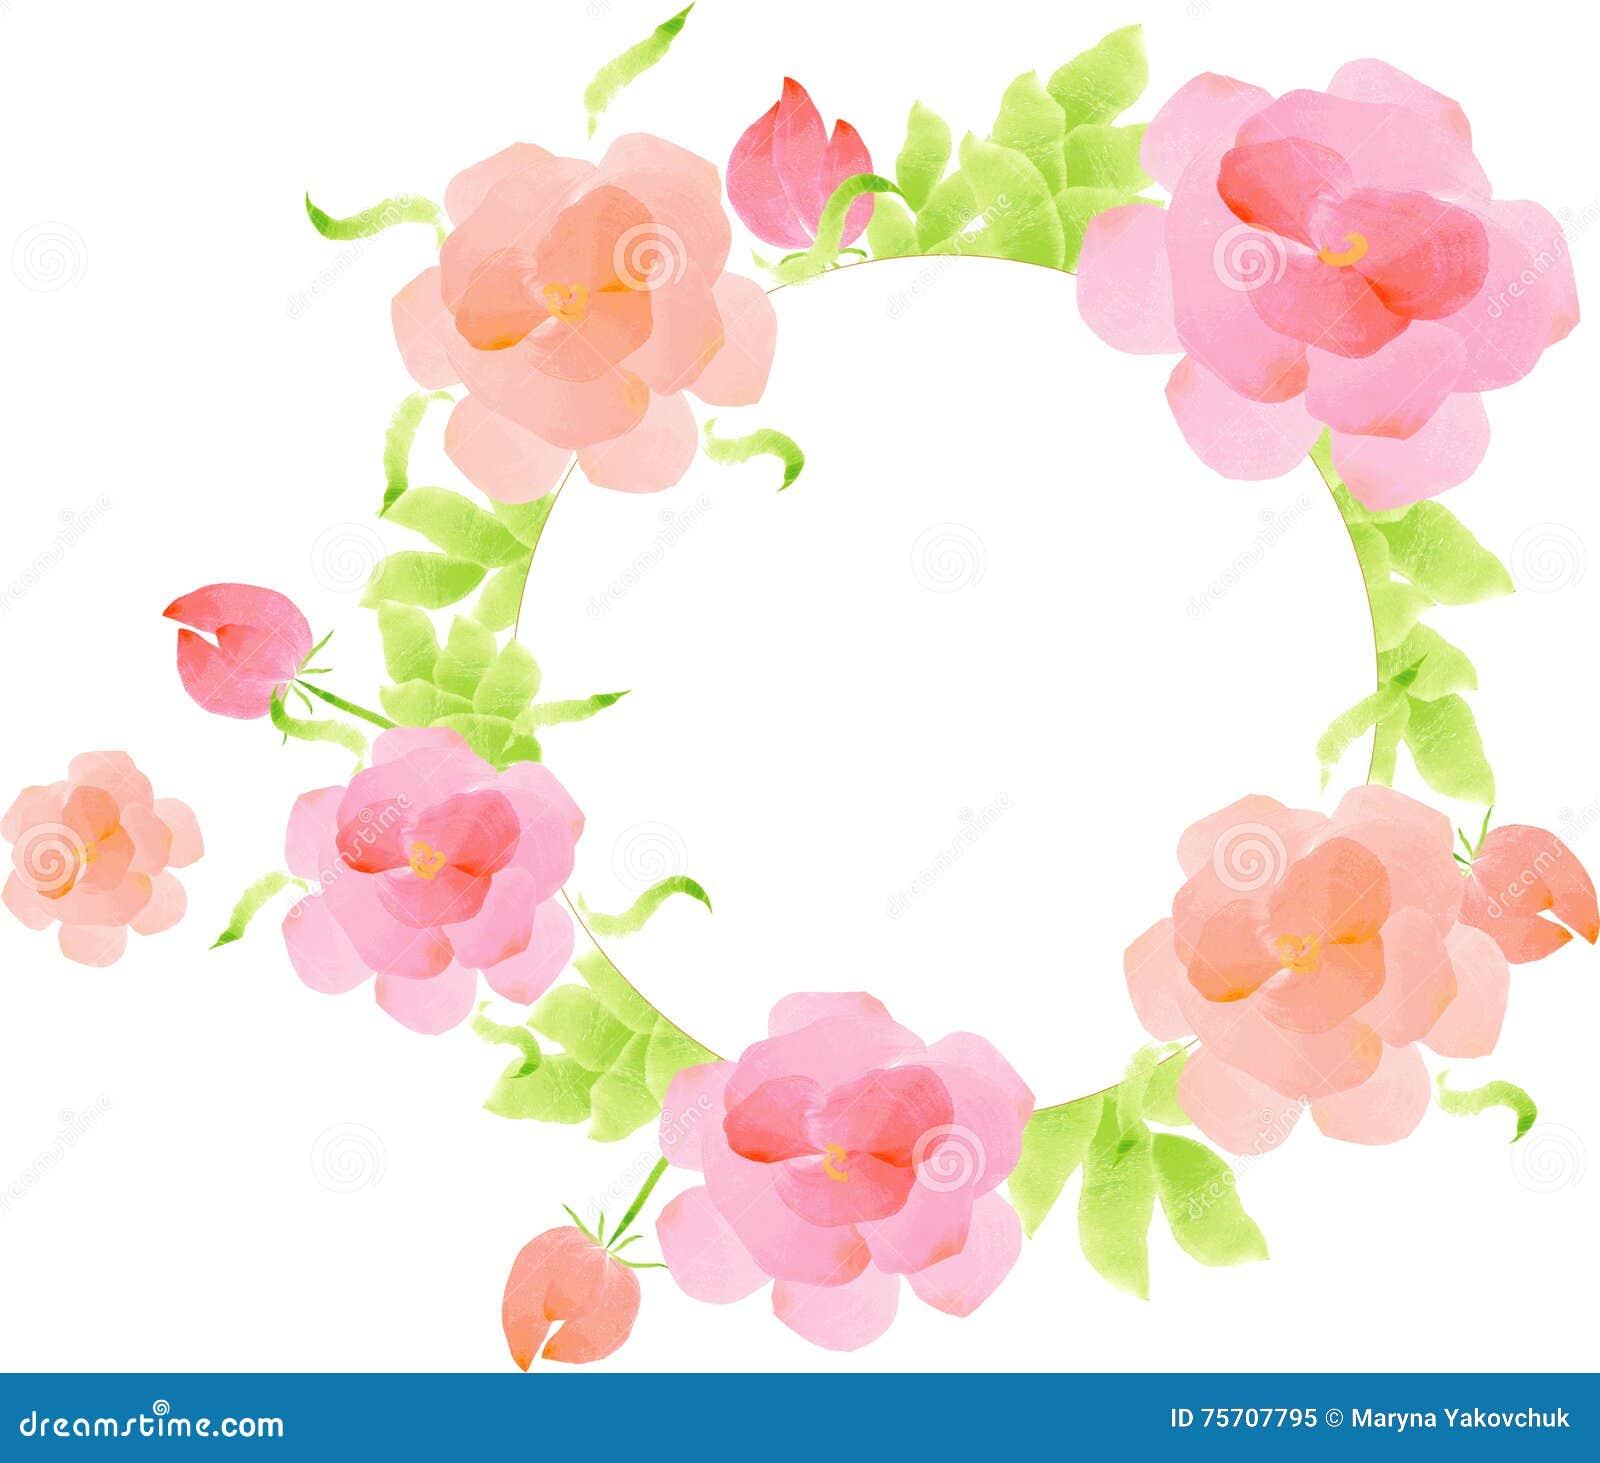 Watercolor flowers template